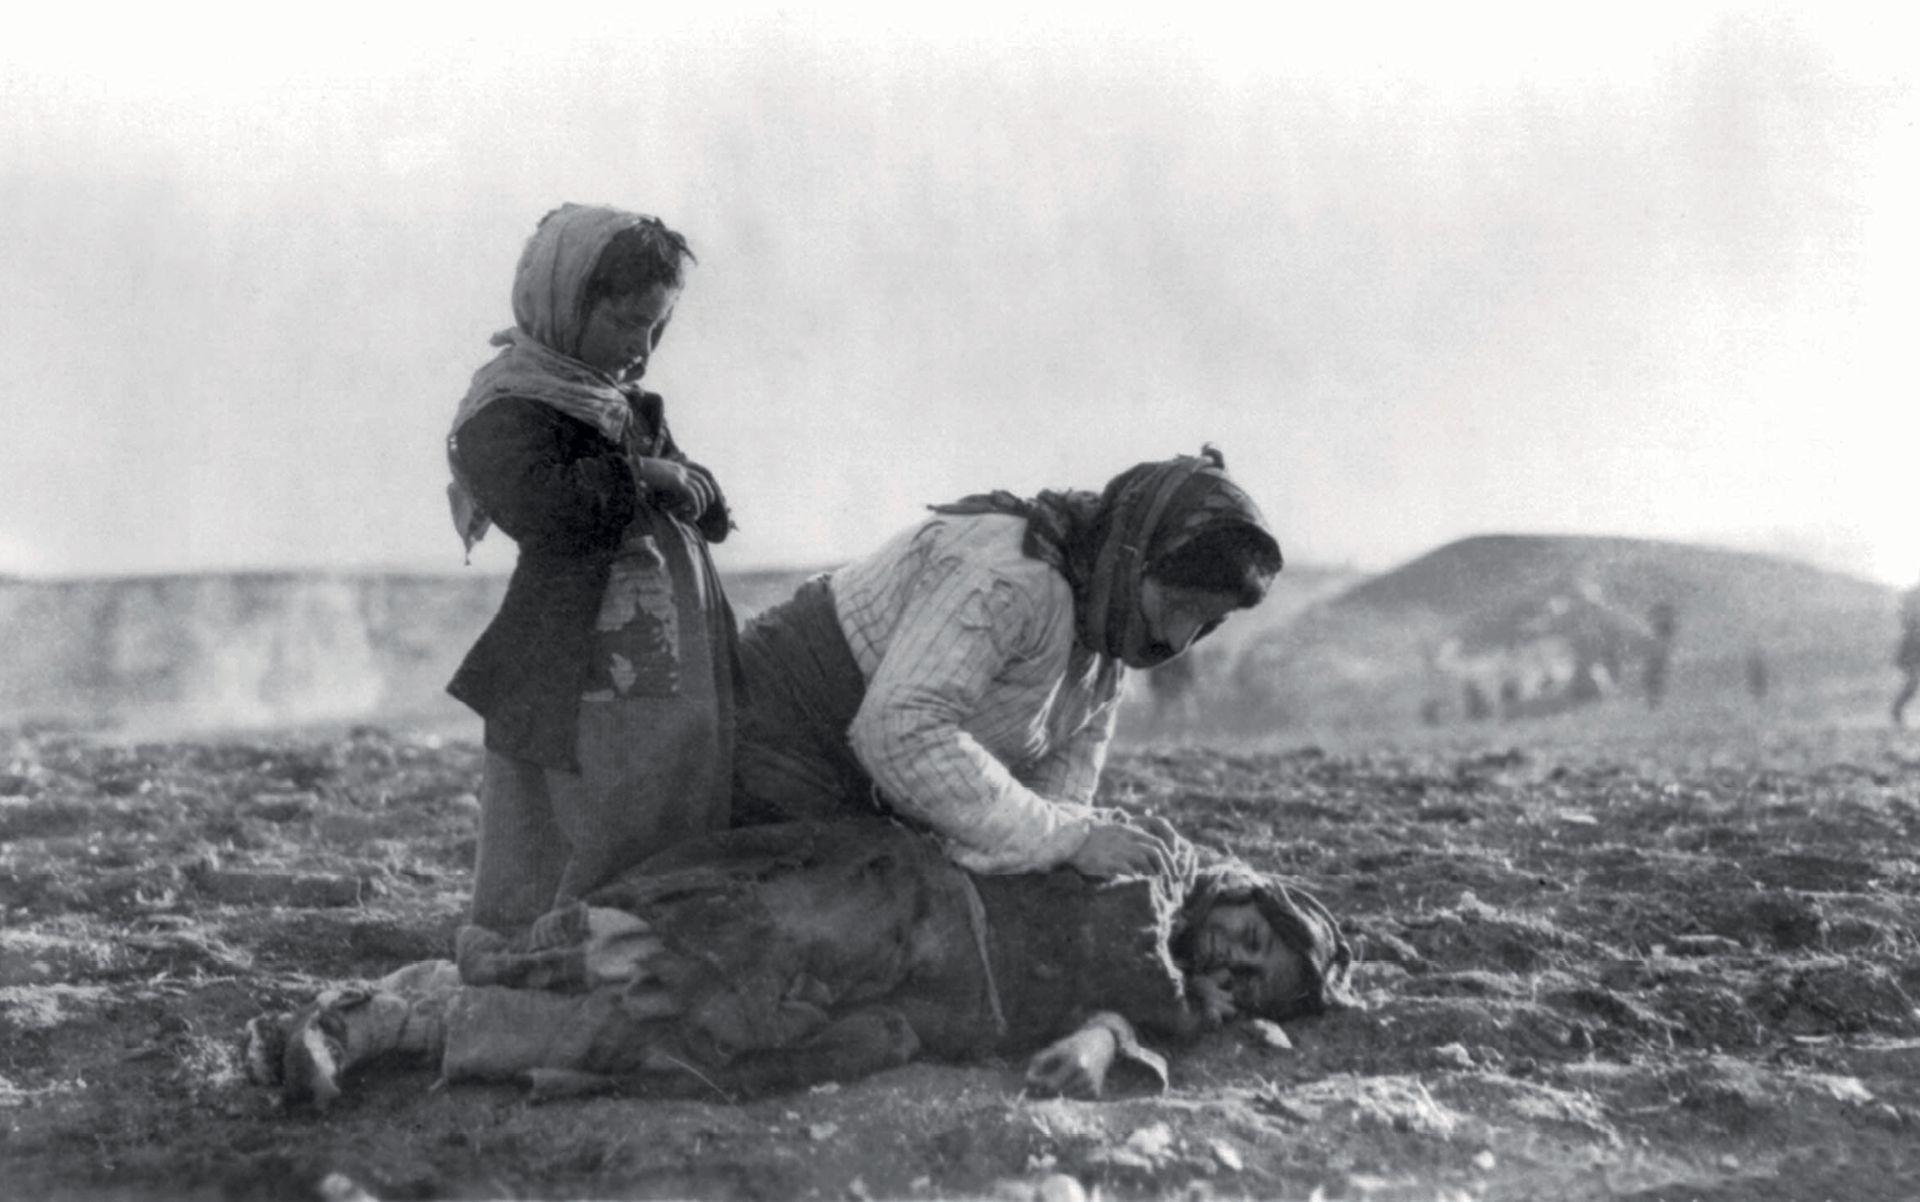 Nizozemska priznala masakr nad Armencima 1915. kao genocid